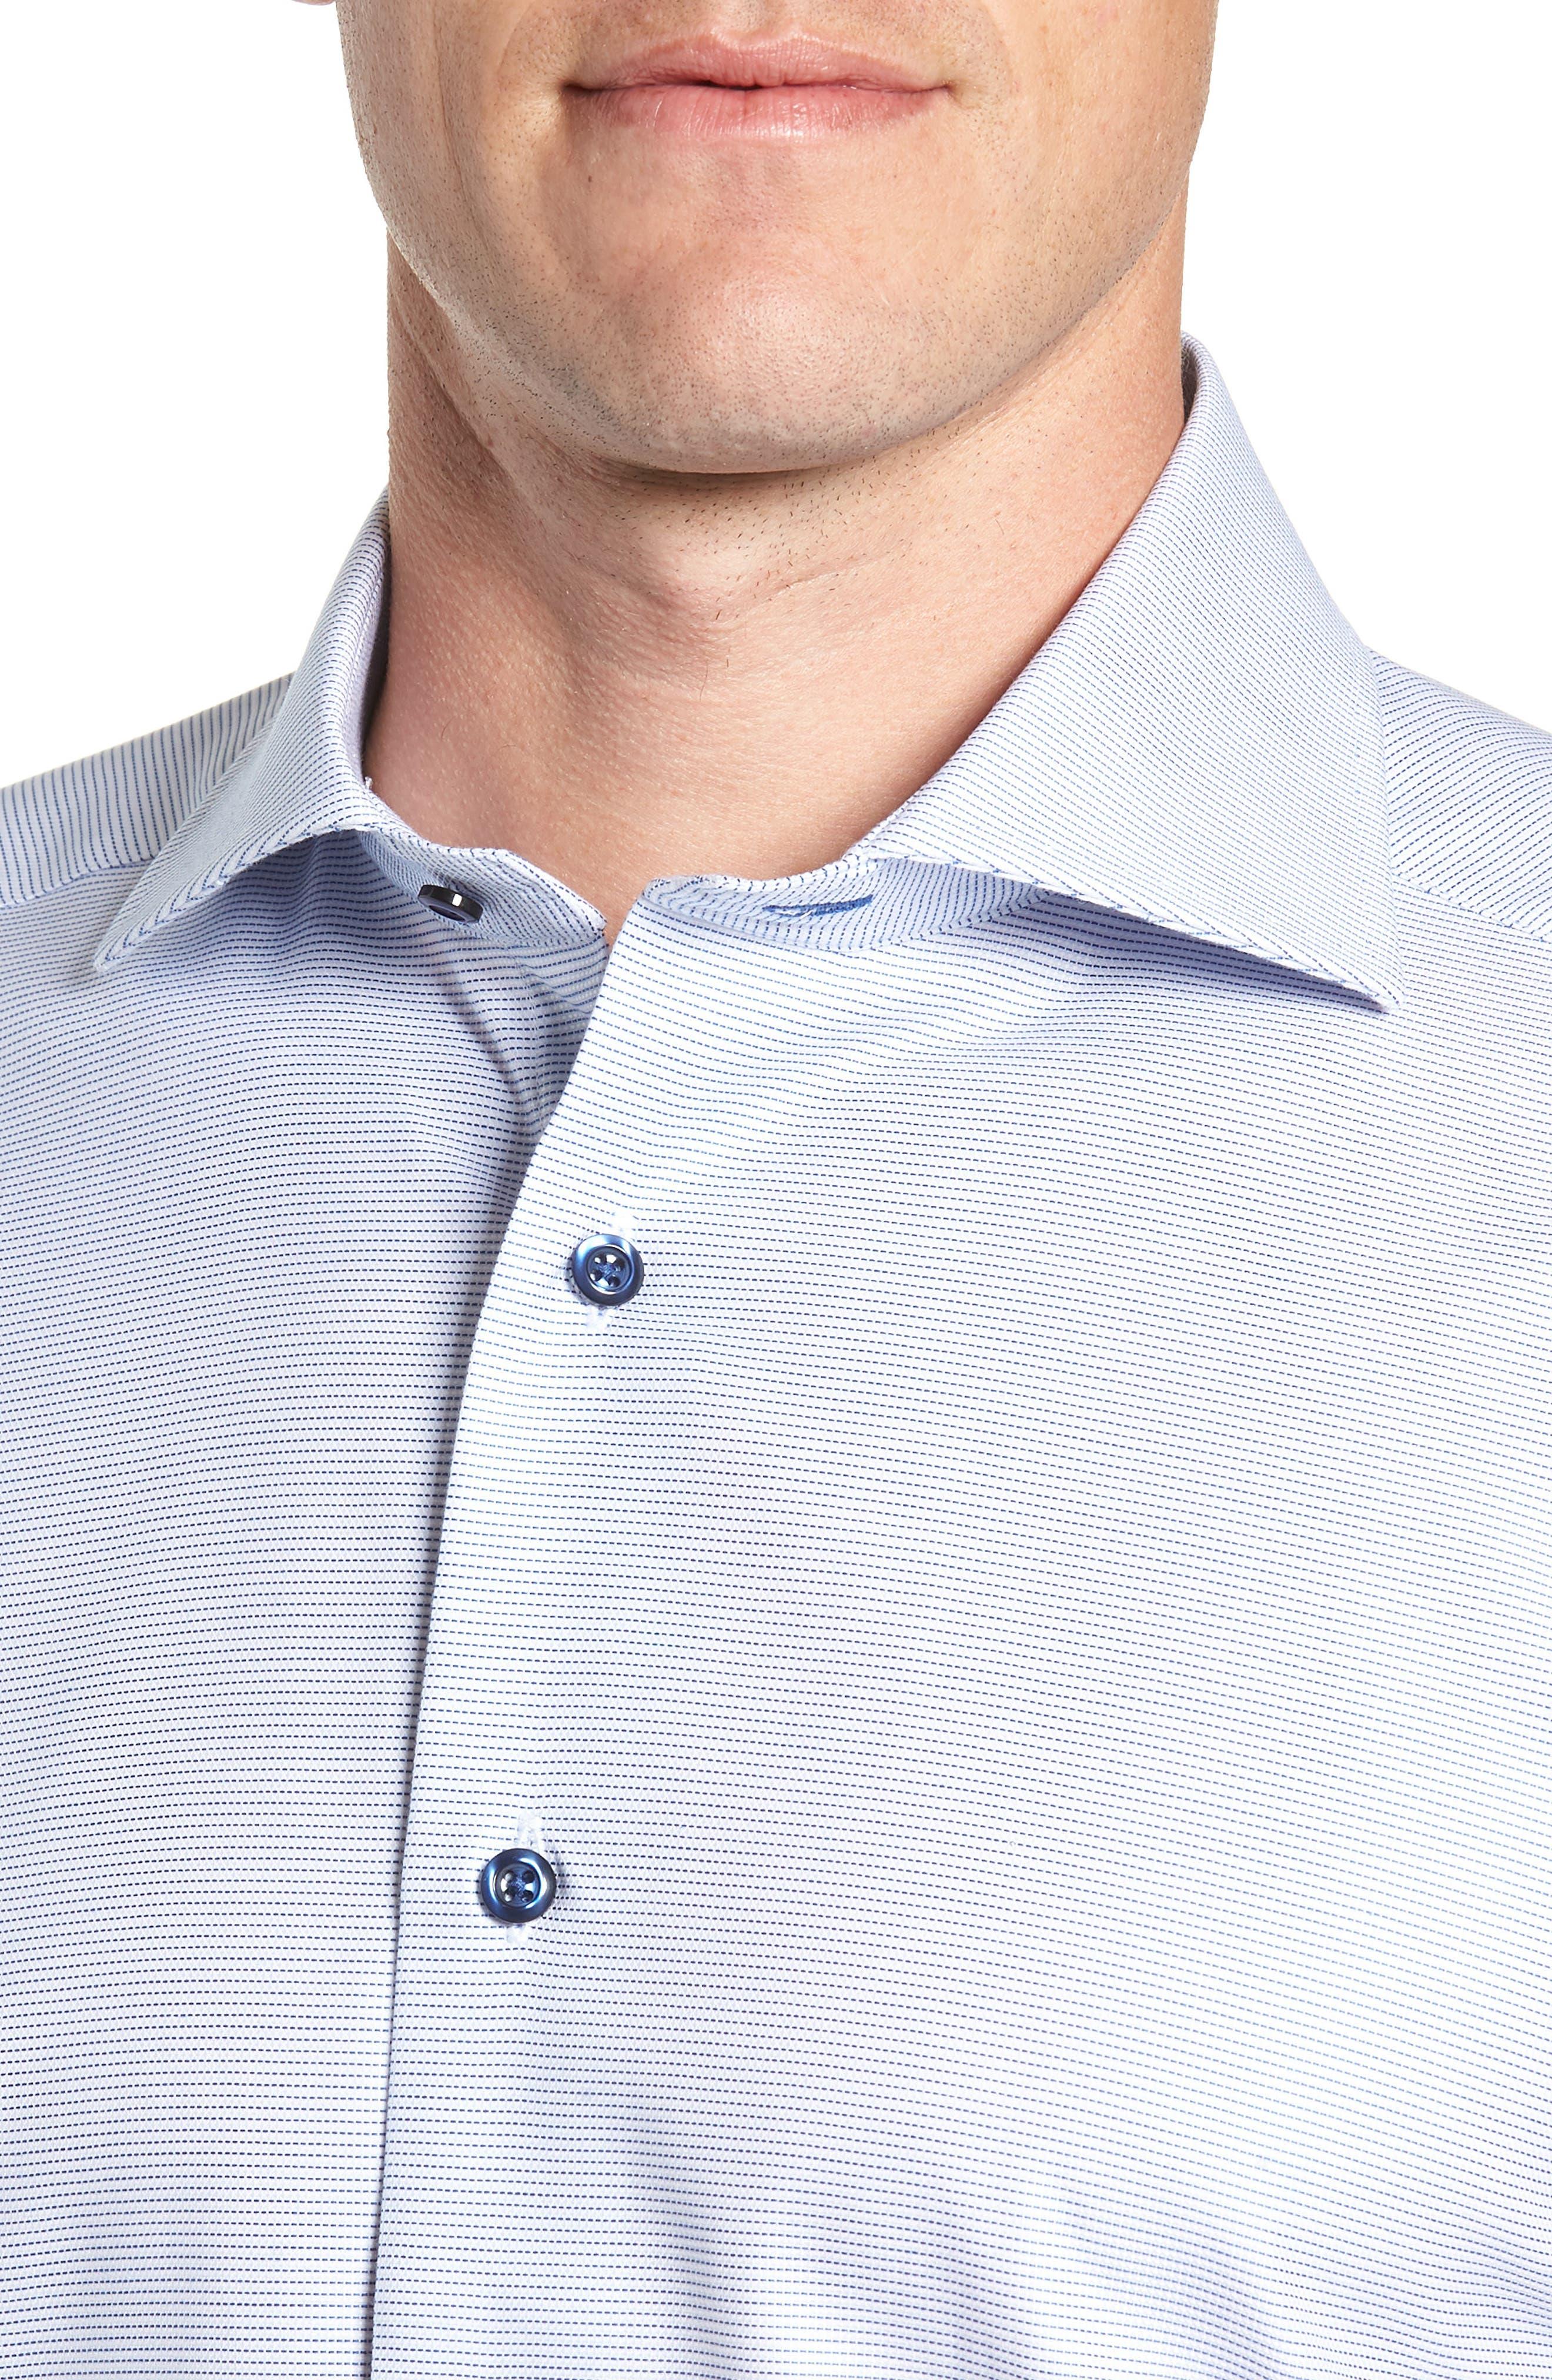 Trim Fit Stripe Dress Shirt,                             Alternate thumbnail 2, color,                             BLUE